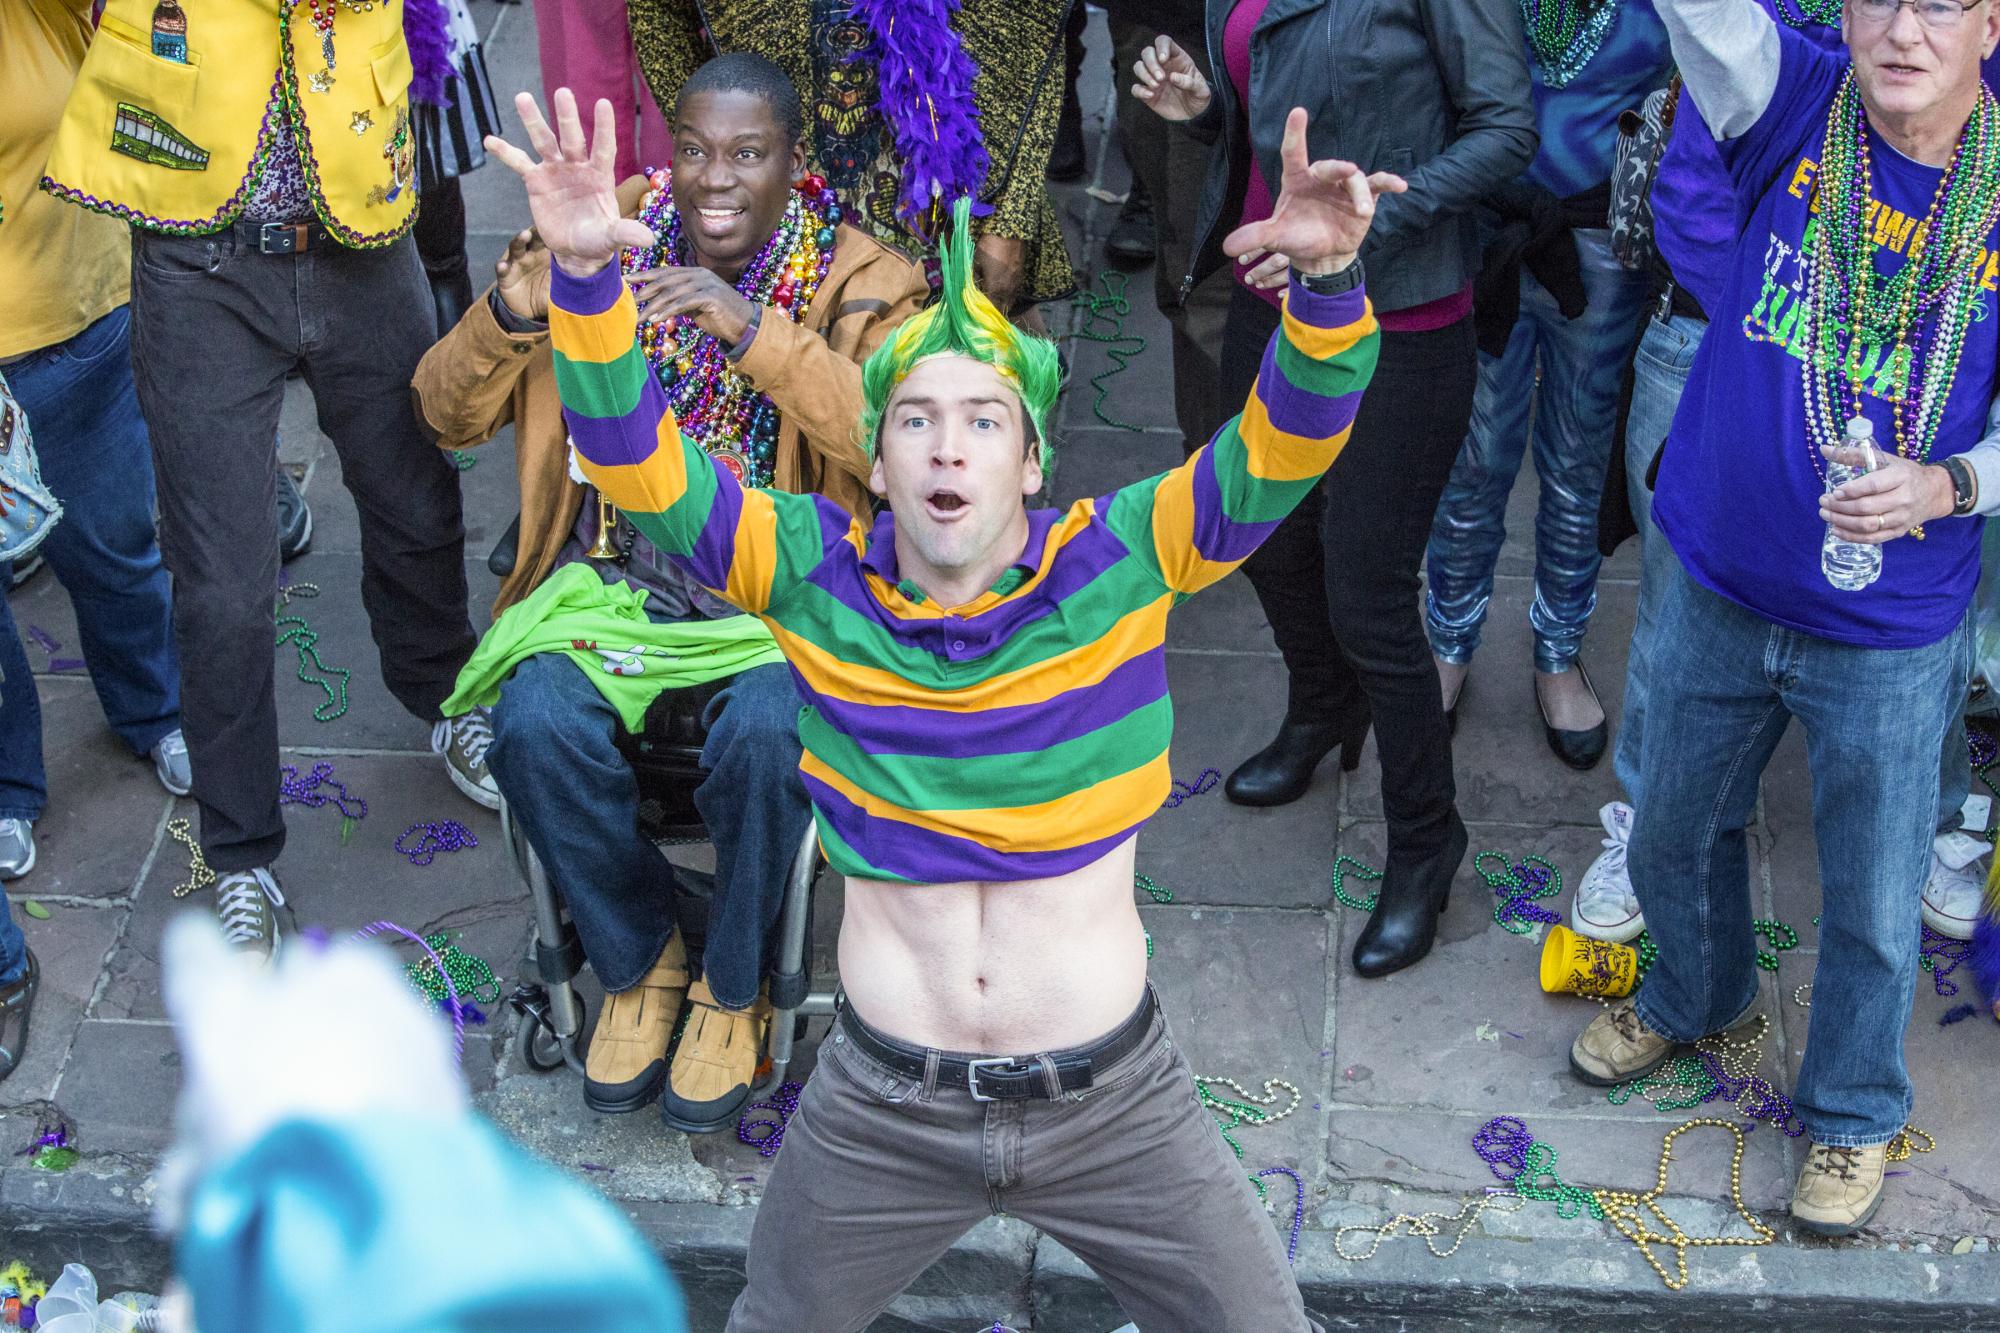 Nobody does Mardi Gras like NOLA